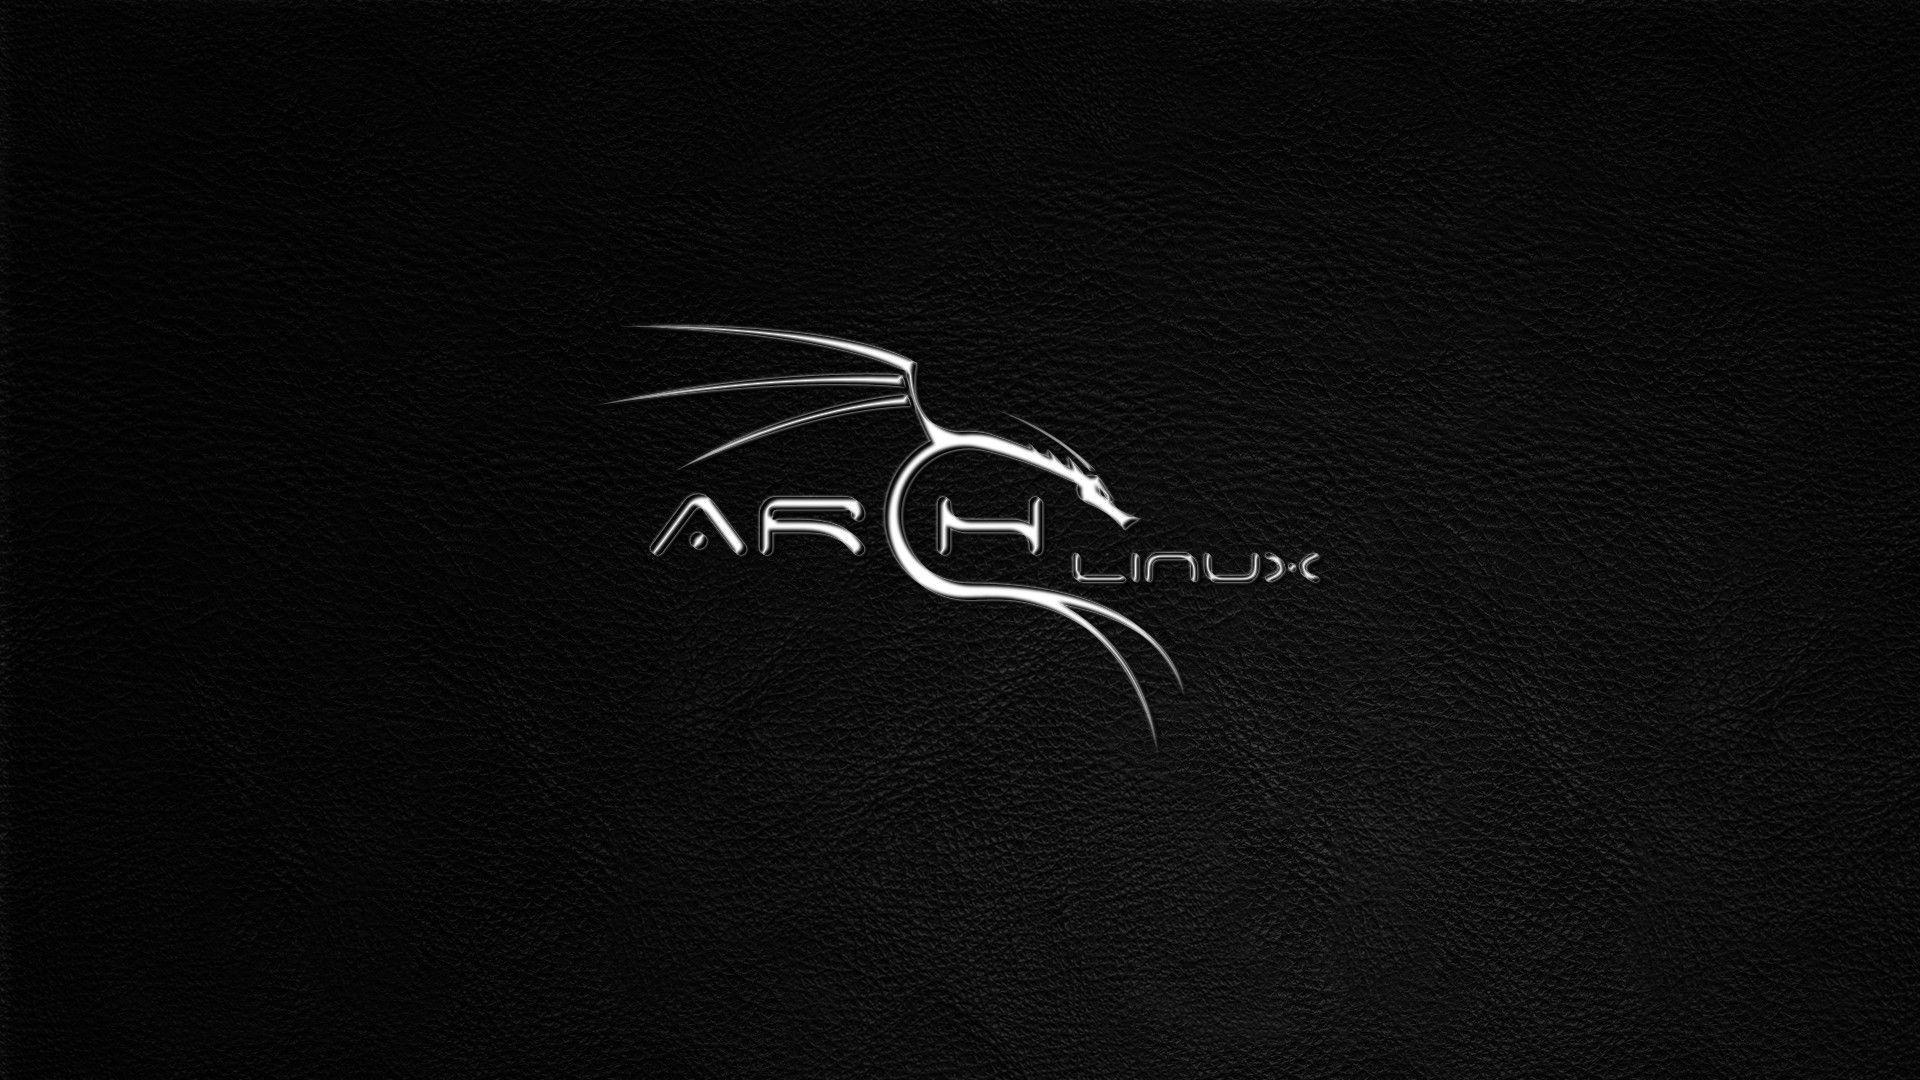 Black Arch Linux Wallpaper - WallpaperSafari | Desktop wallpaper